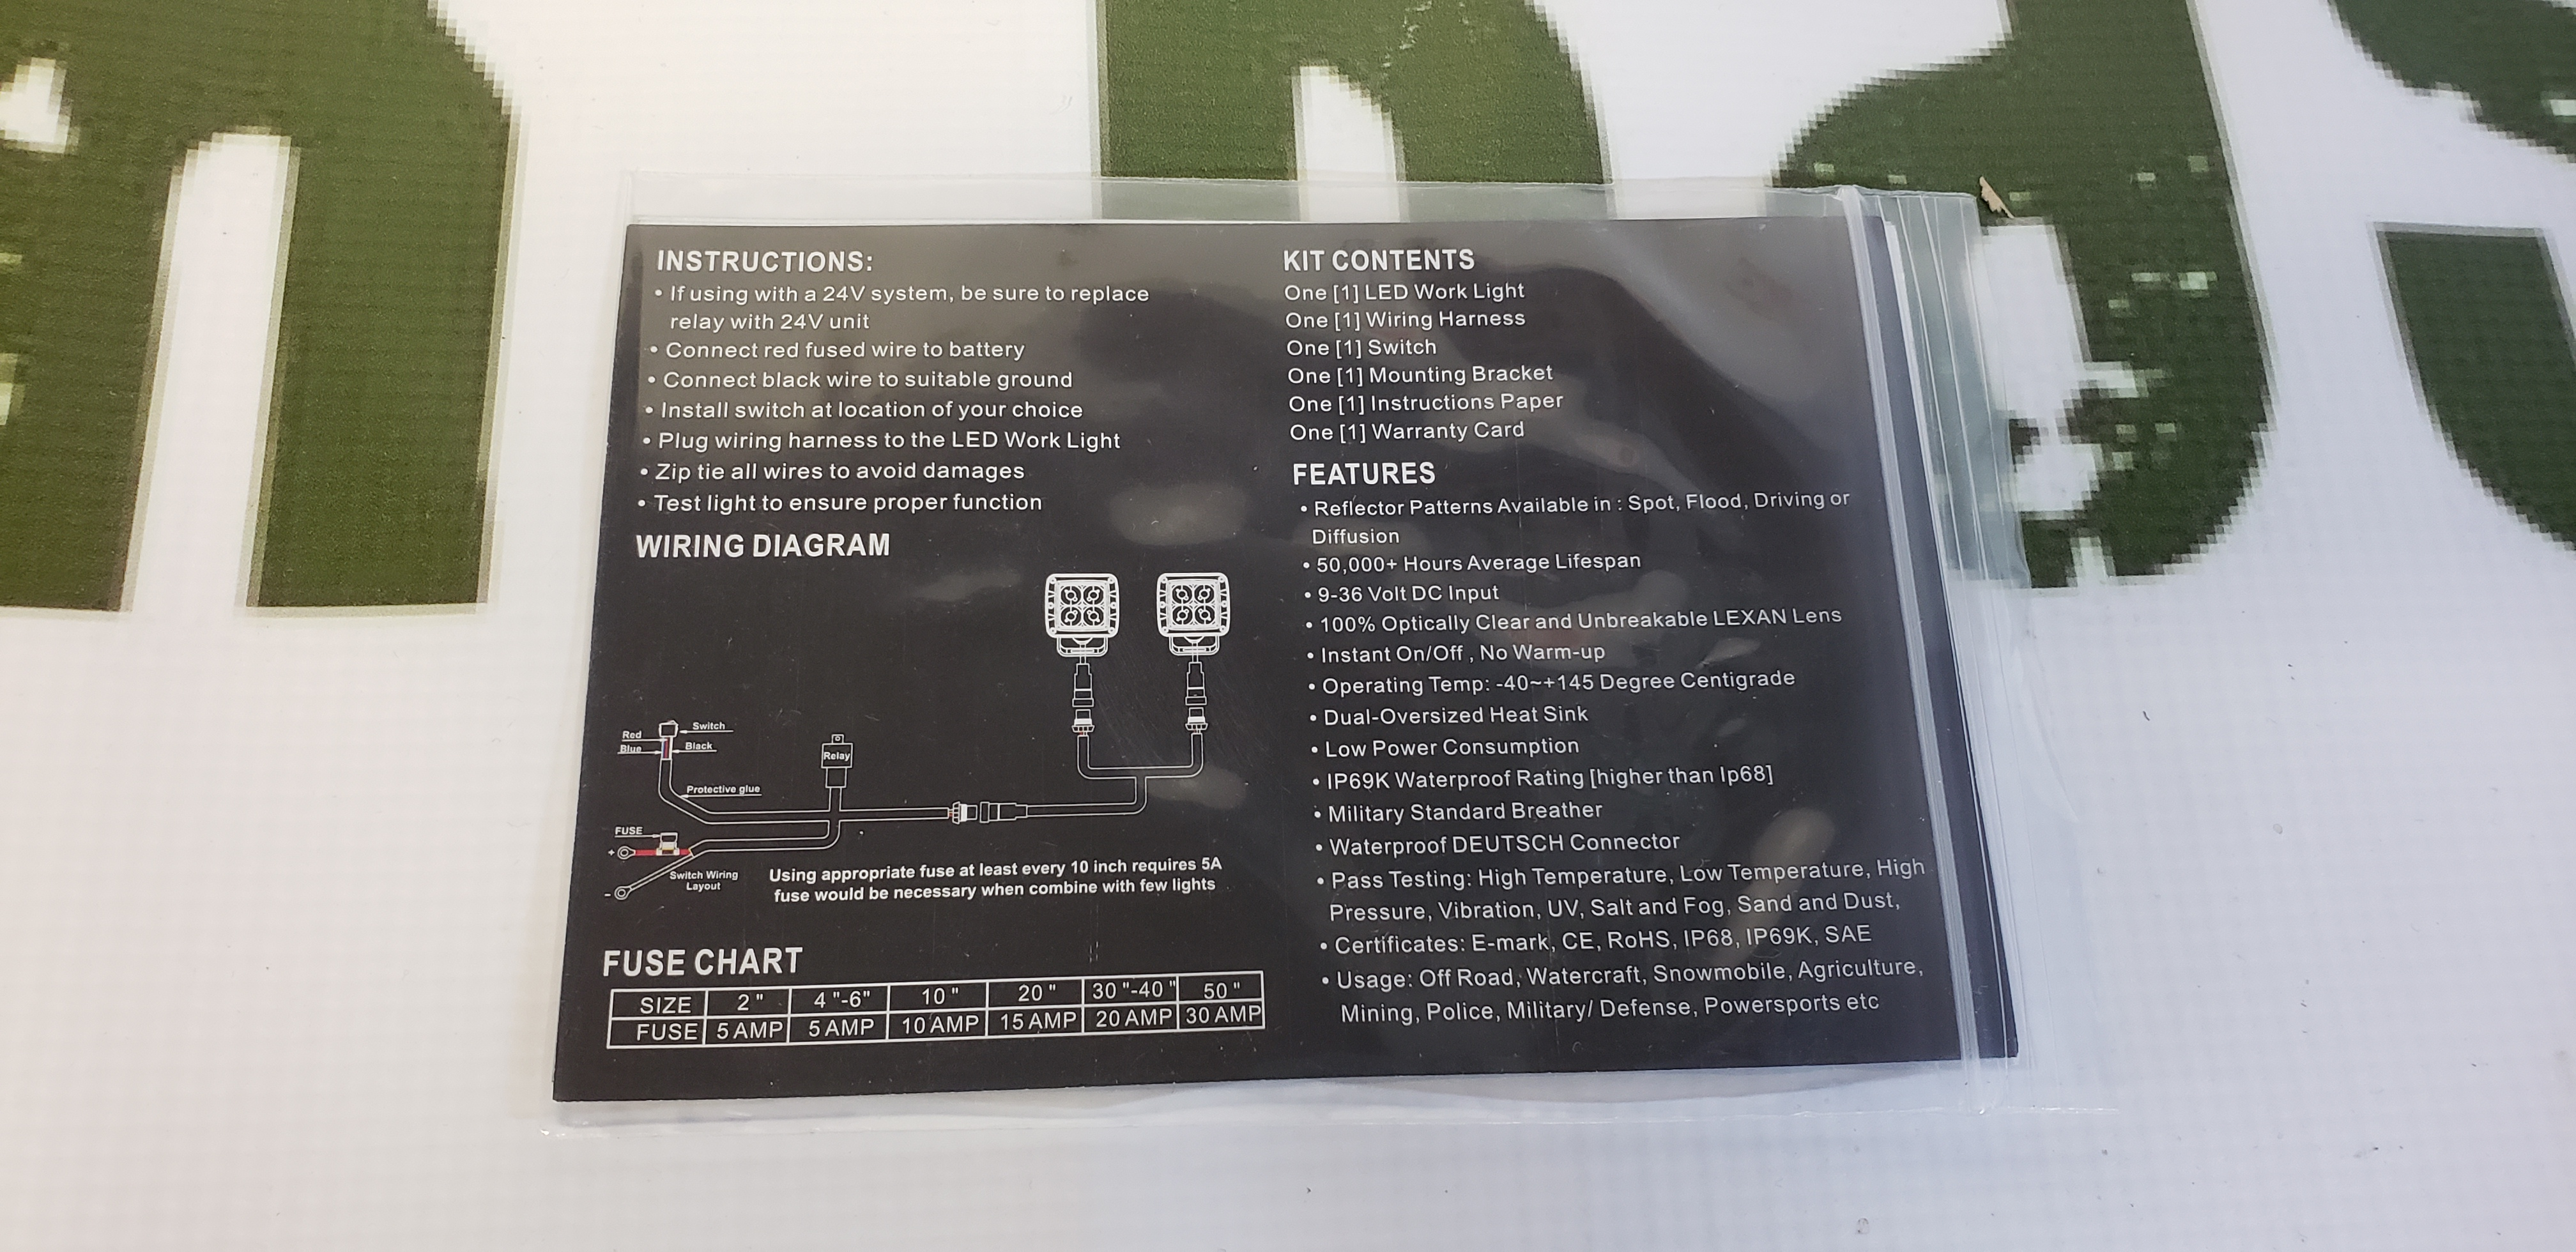 Cree 6w Led Bulb Wiring Diagram - Schematics Online Cree W Led Bulb Wiring Diagram on